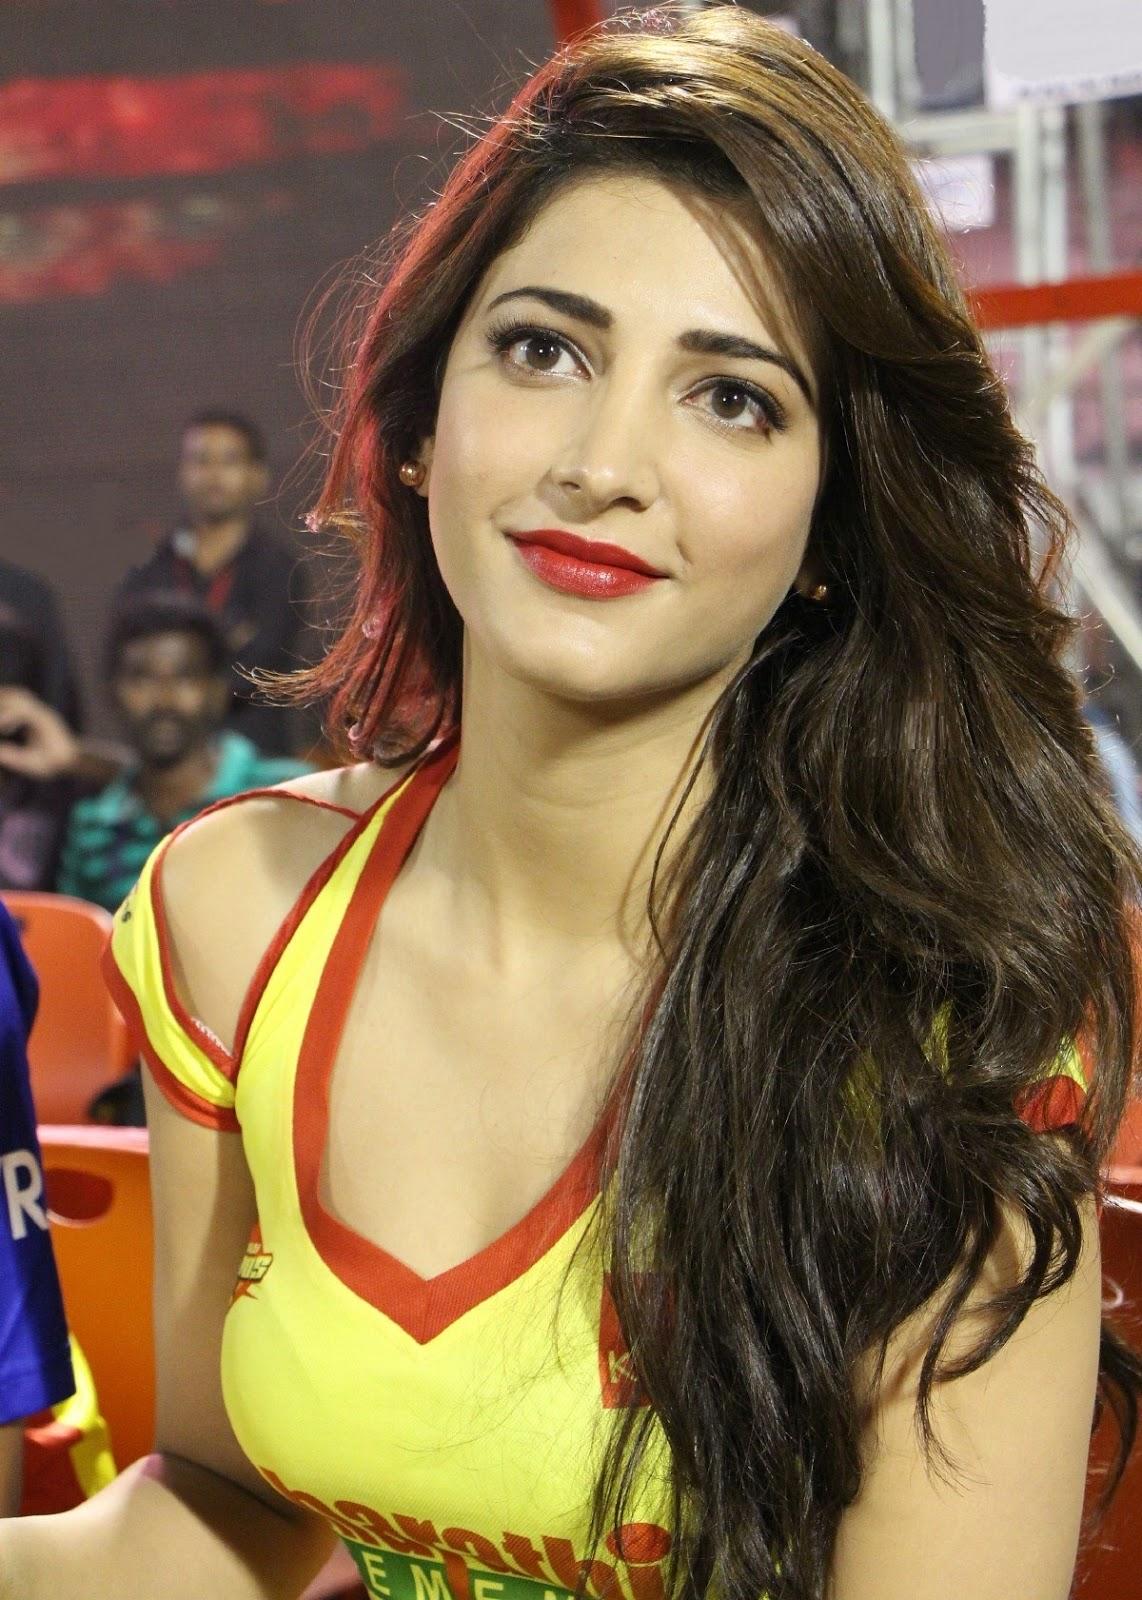 hot pics of shruti hassan | bollywood glitz 24 - hot bollywood actress